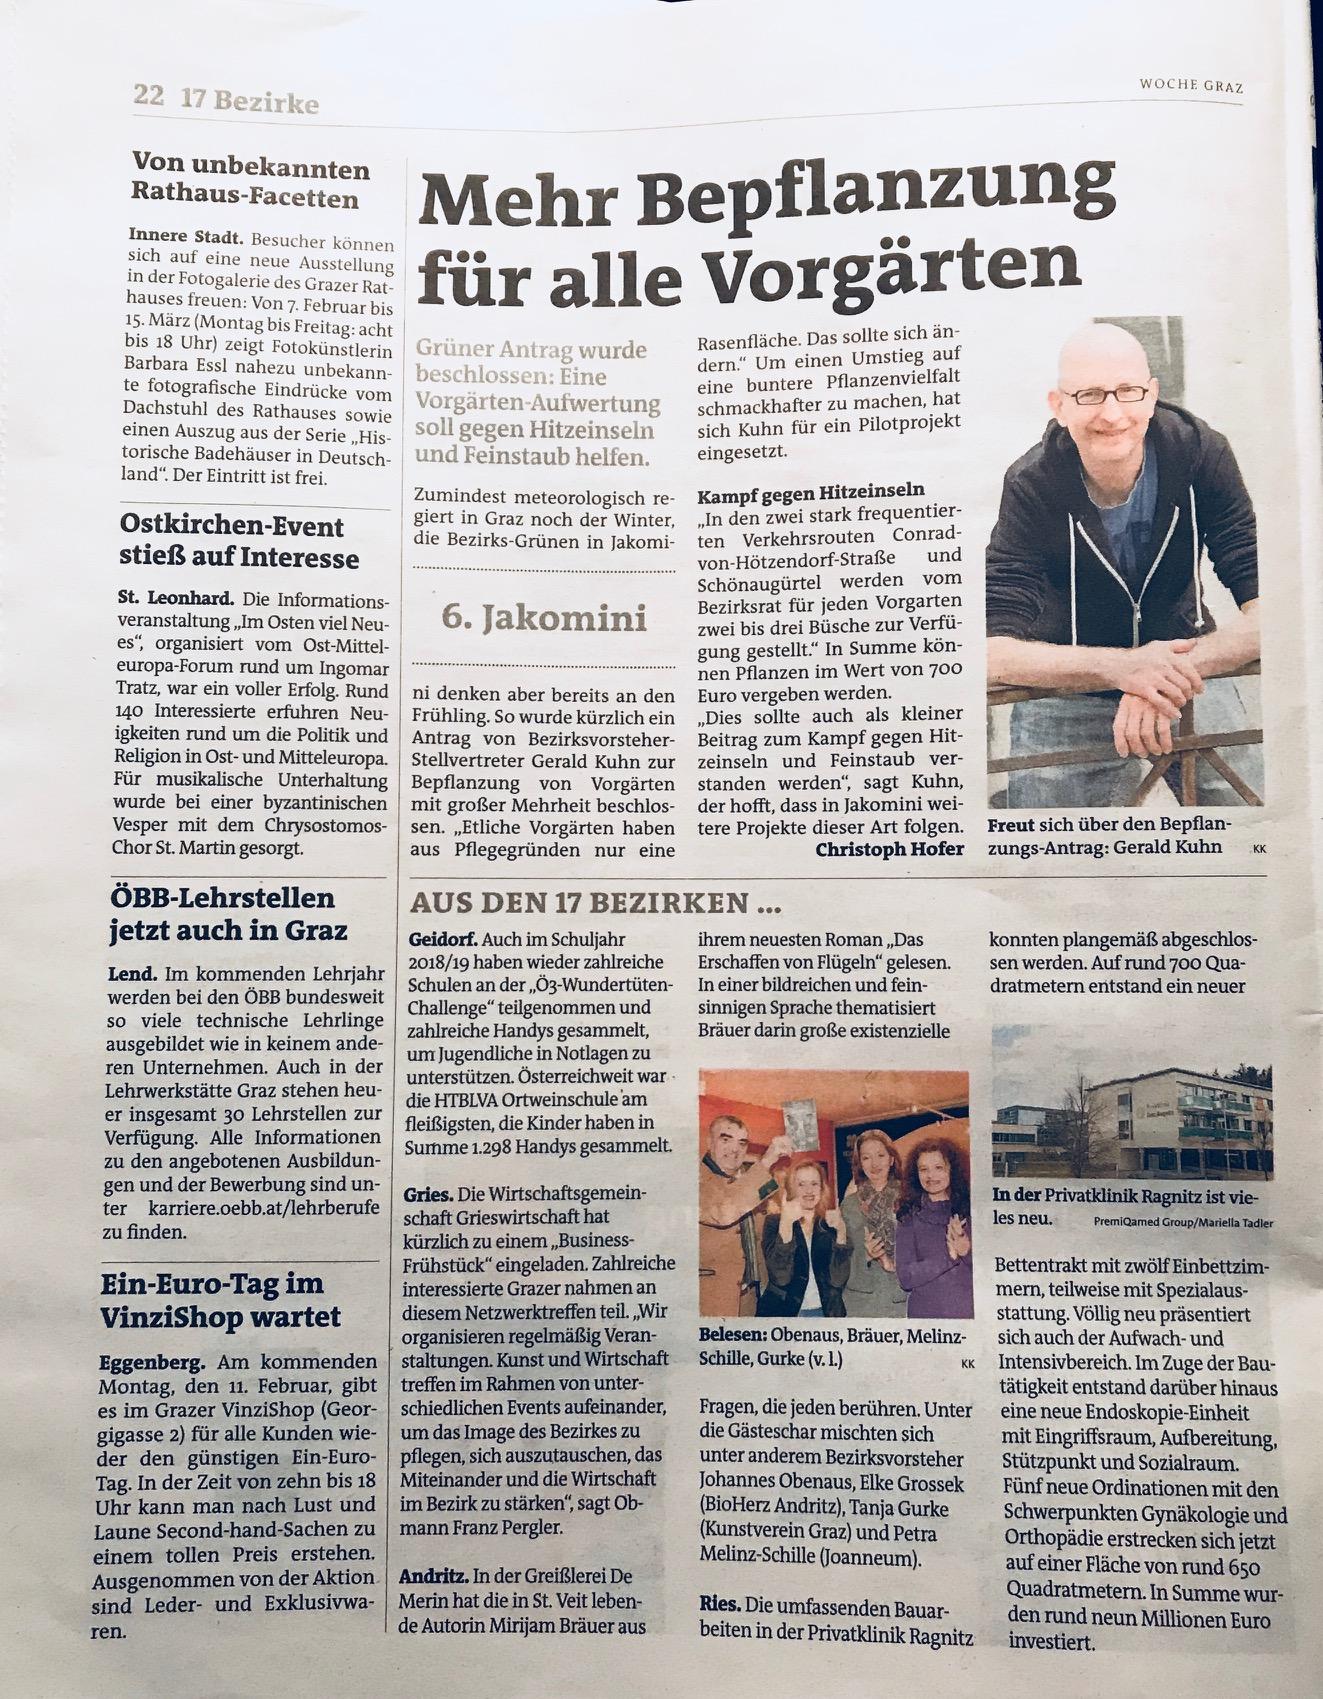 Mirijam Braeuer_Woche_6.Februar 2019